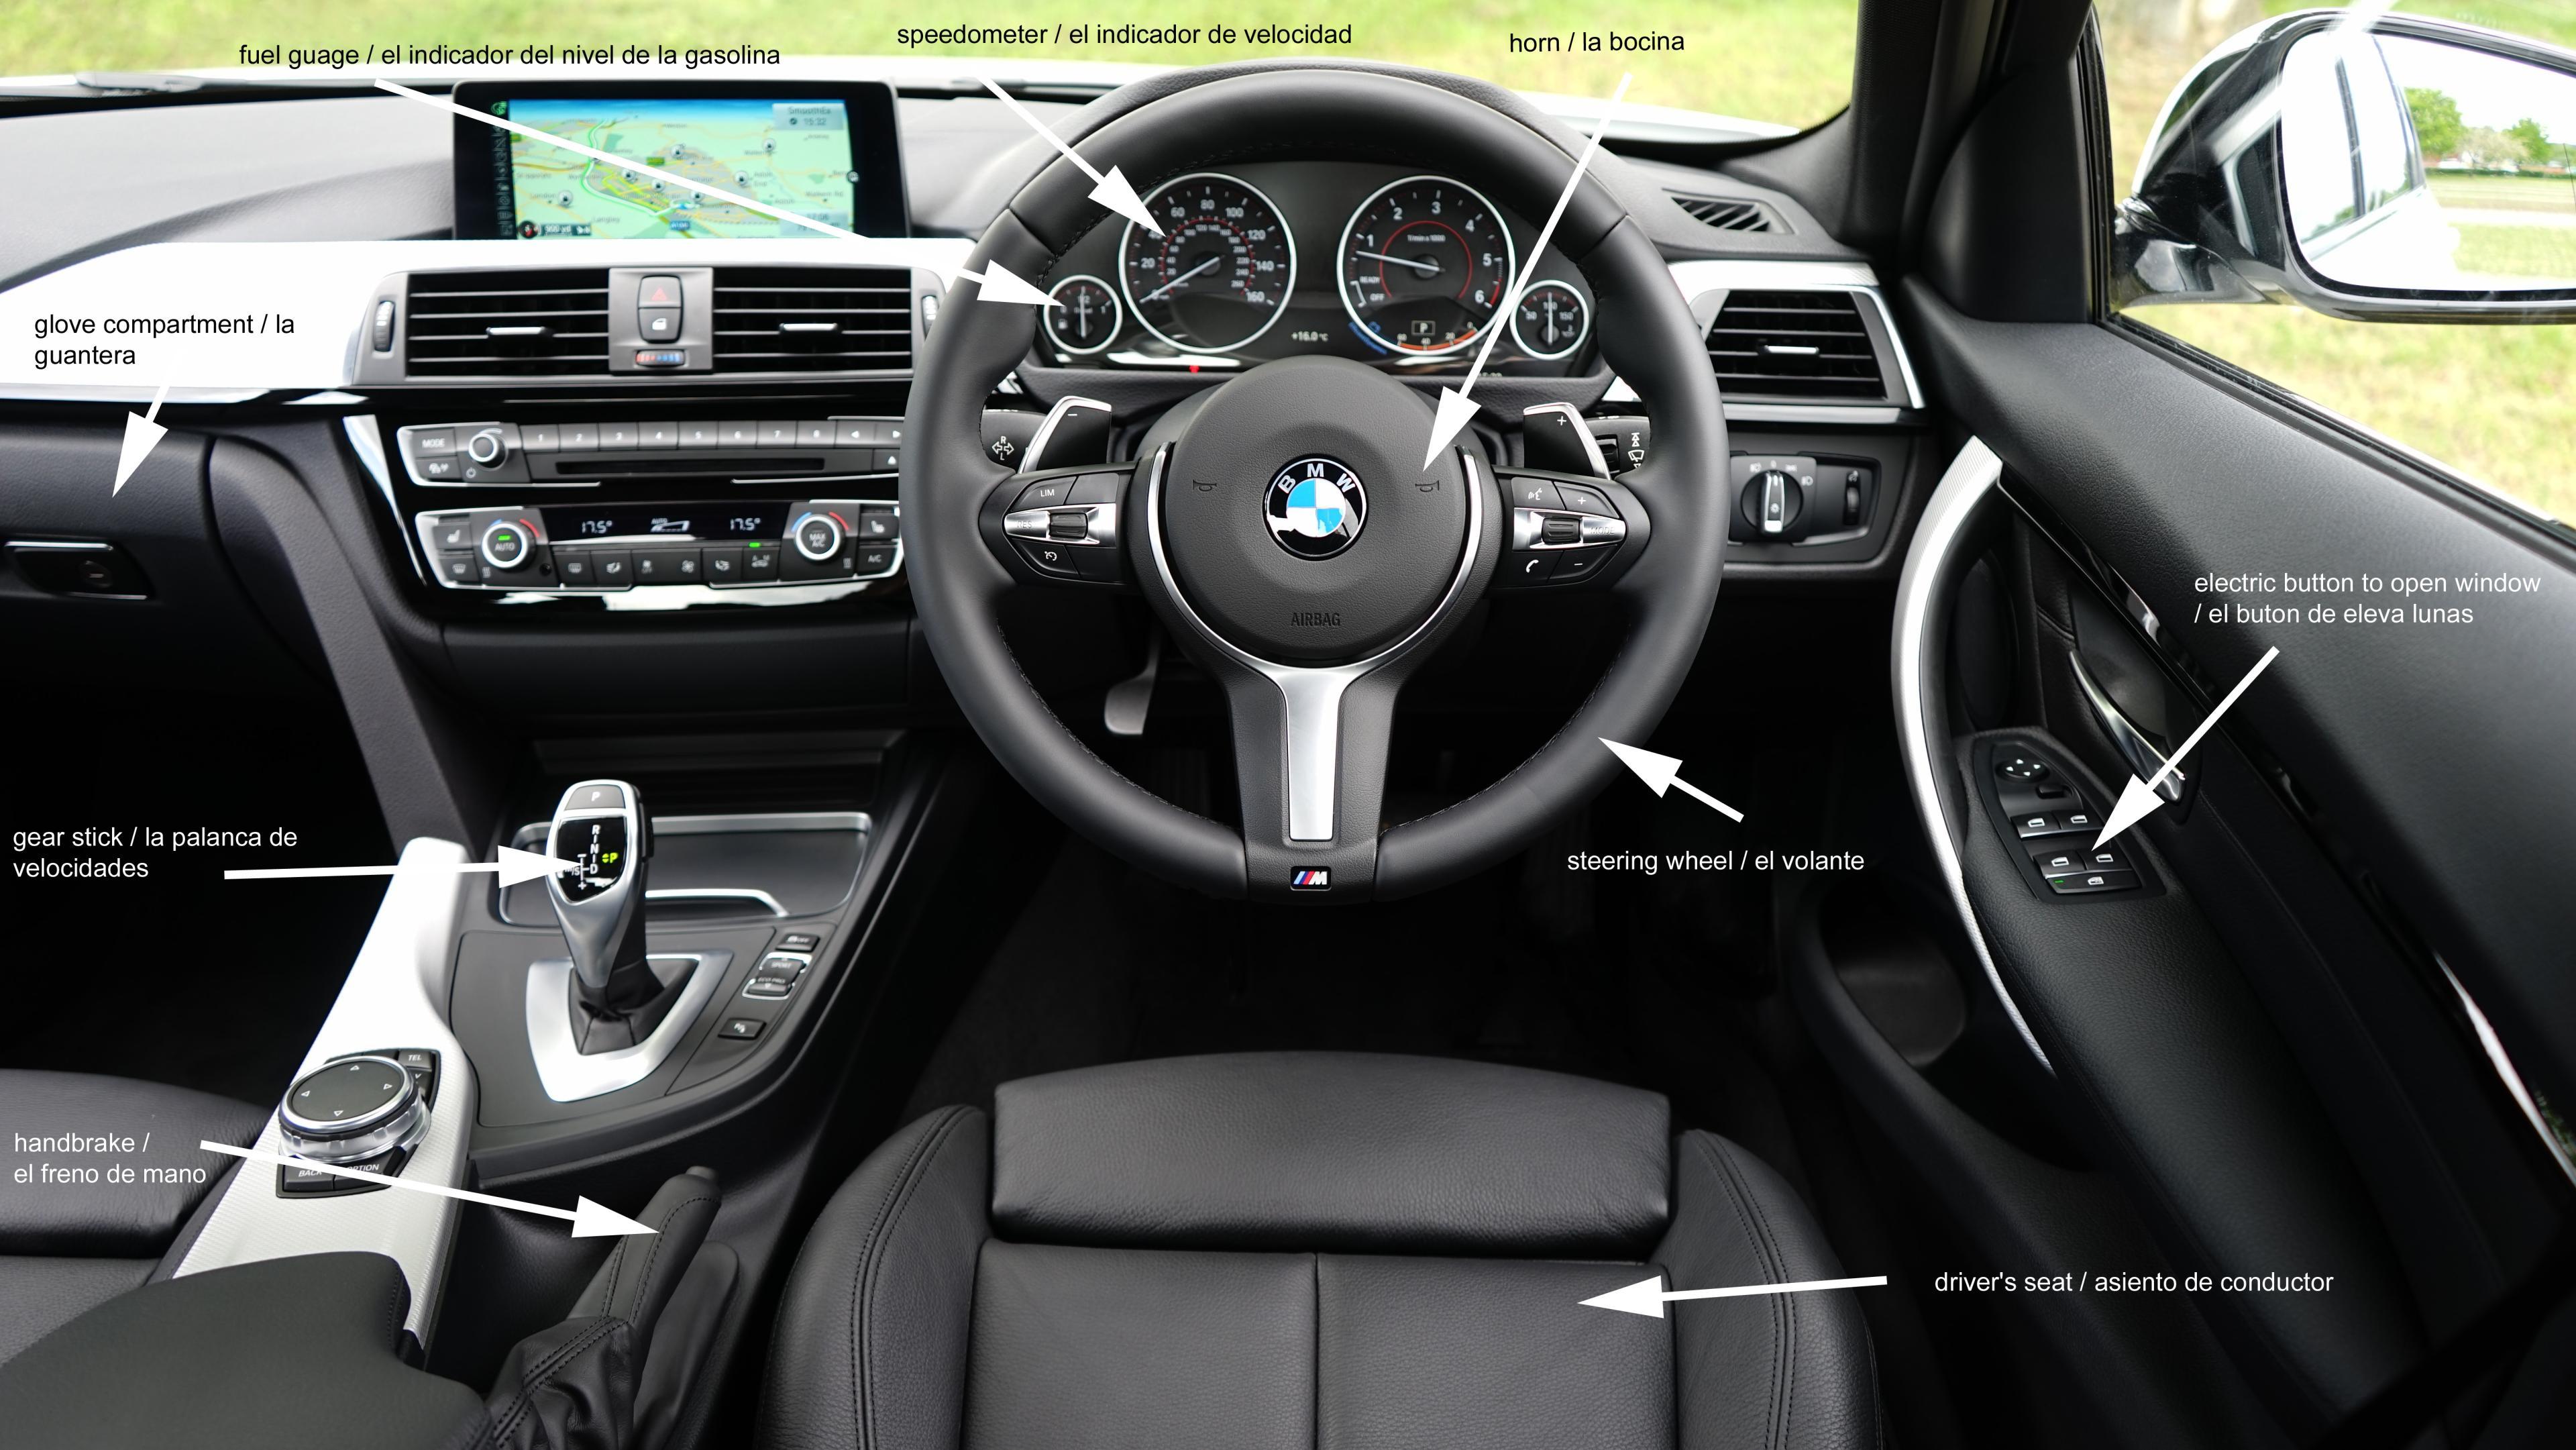 Car Insurance Spain car interior